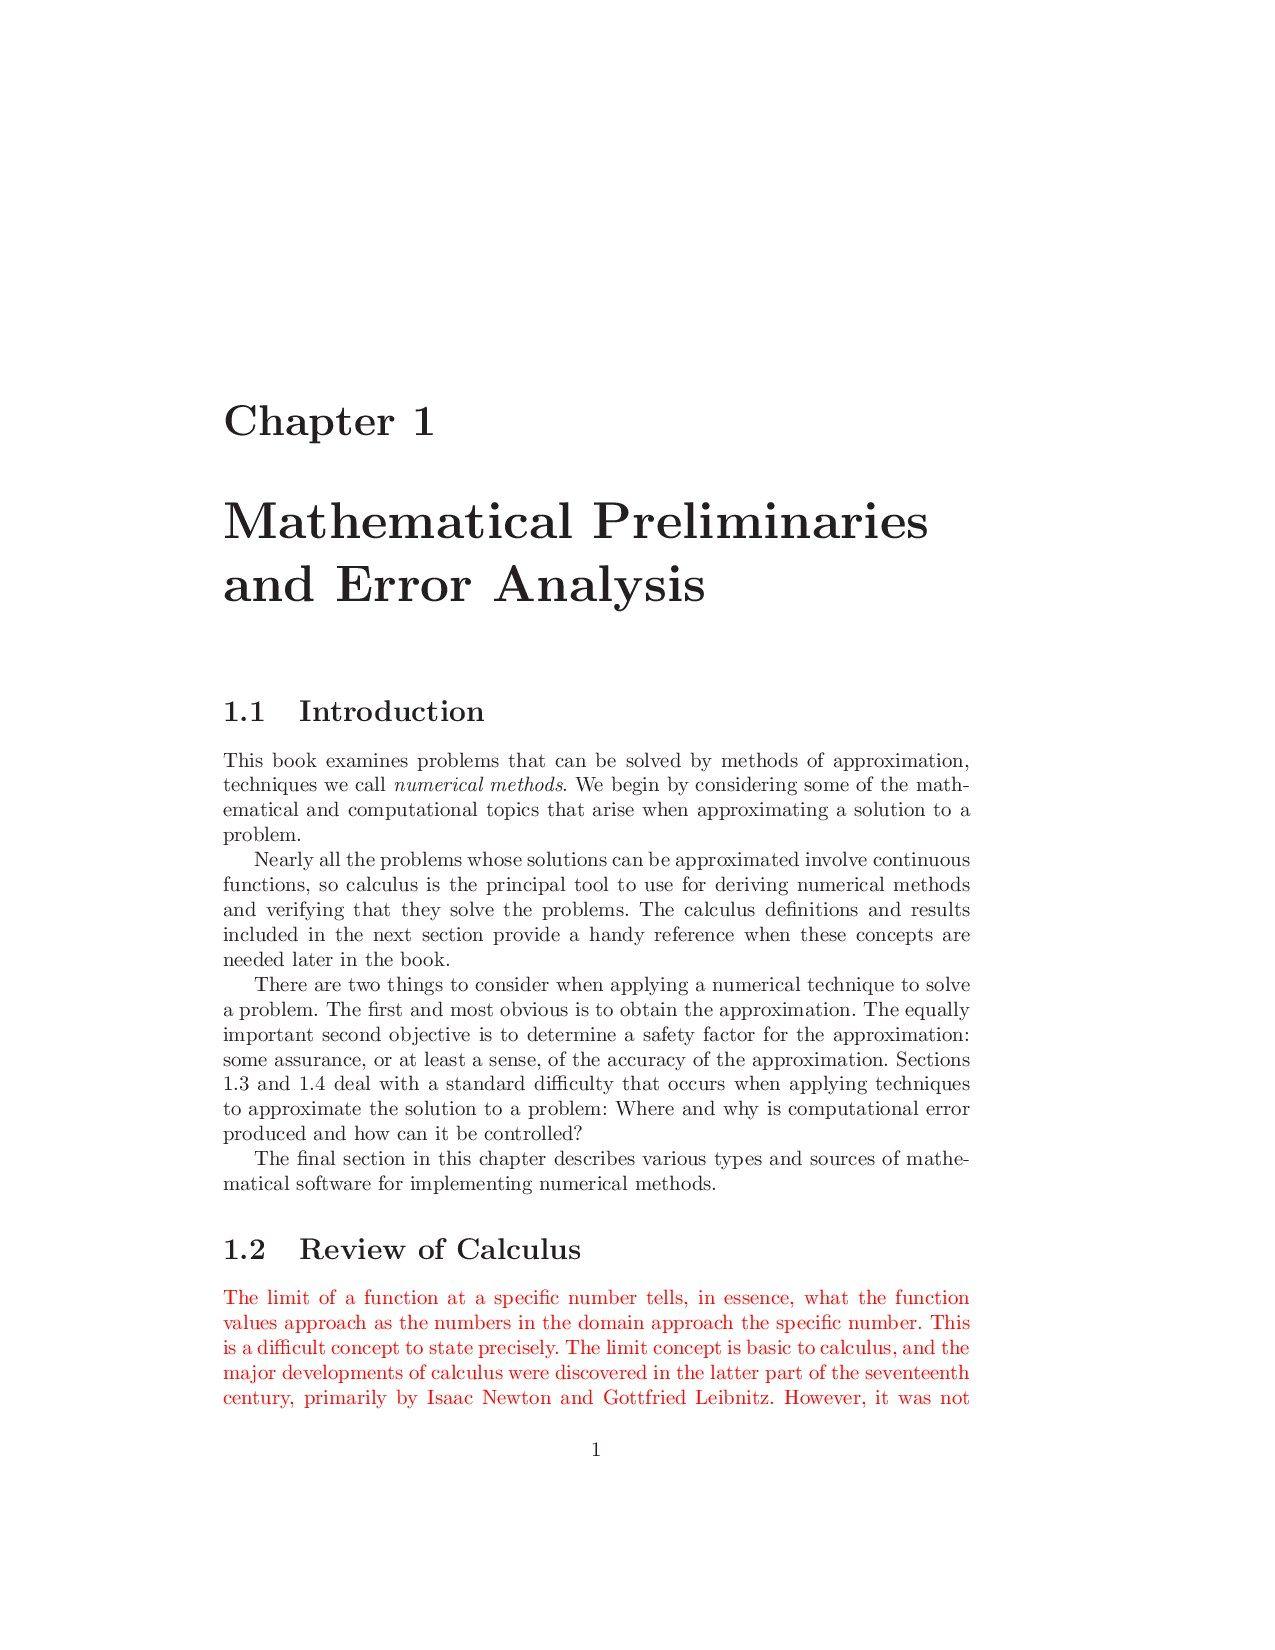 Simplifying Algebraic Expressions Worksheets